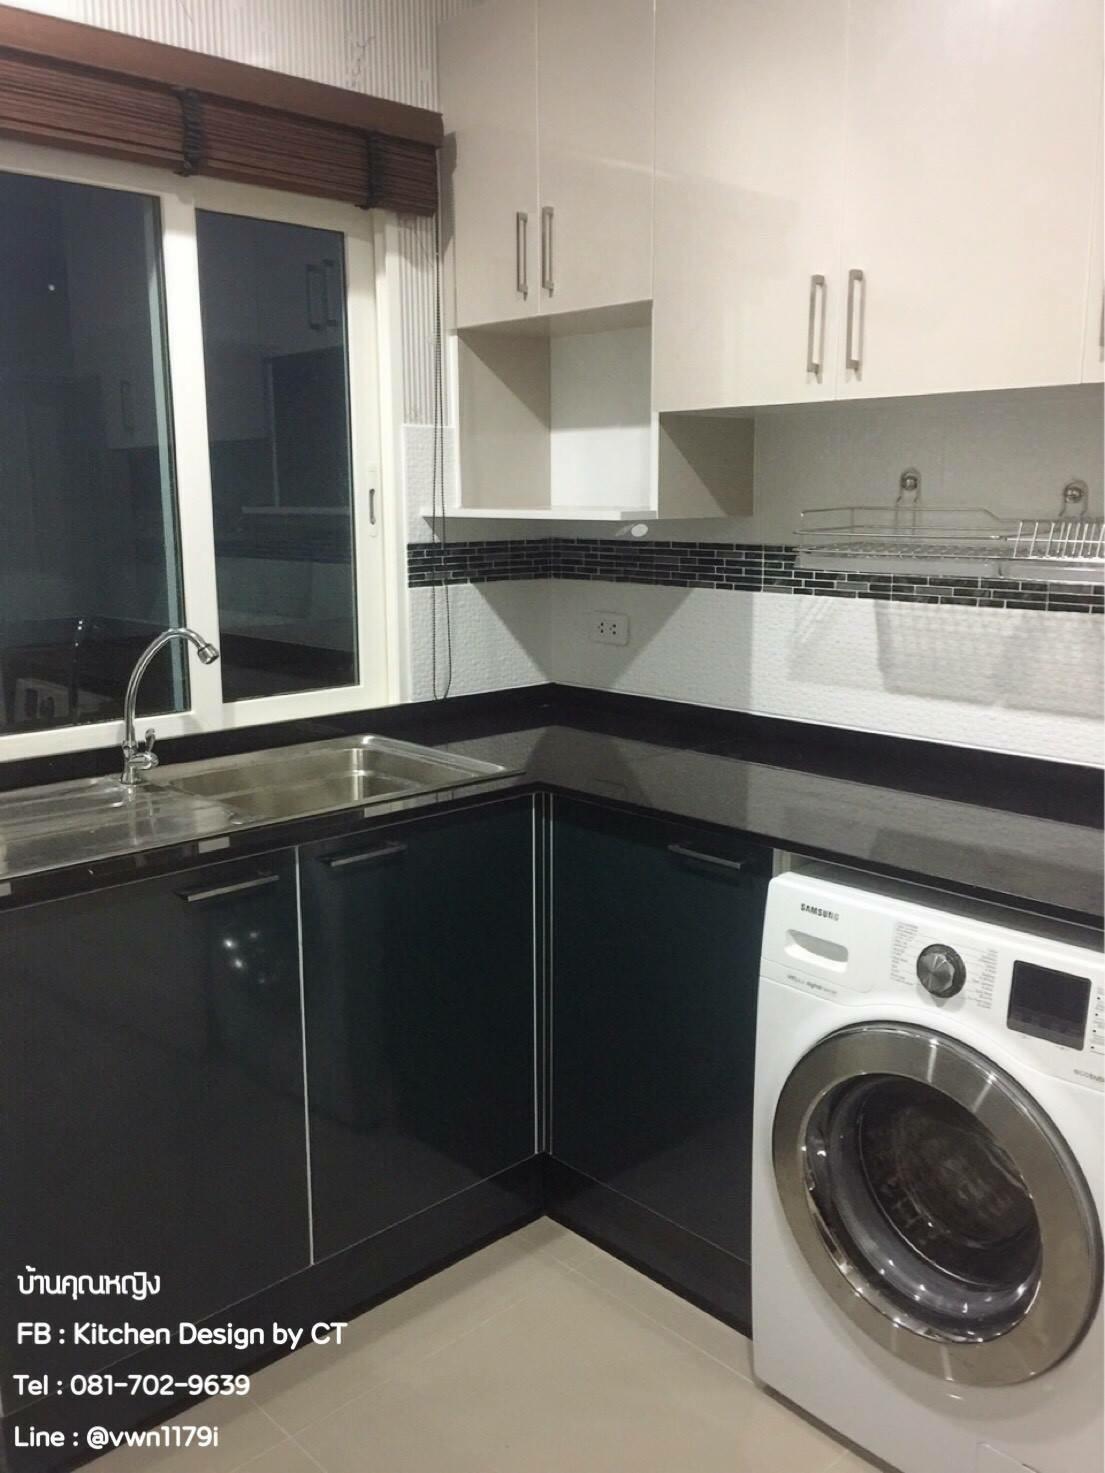 Black & Creamy Kitchen (ครัวบิ้วอินหน้าบานสีดำเงาและสีครีม)